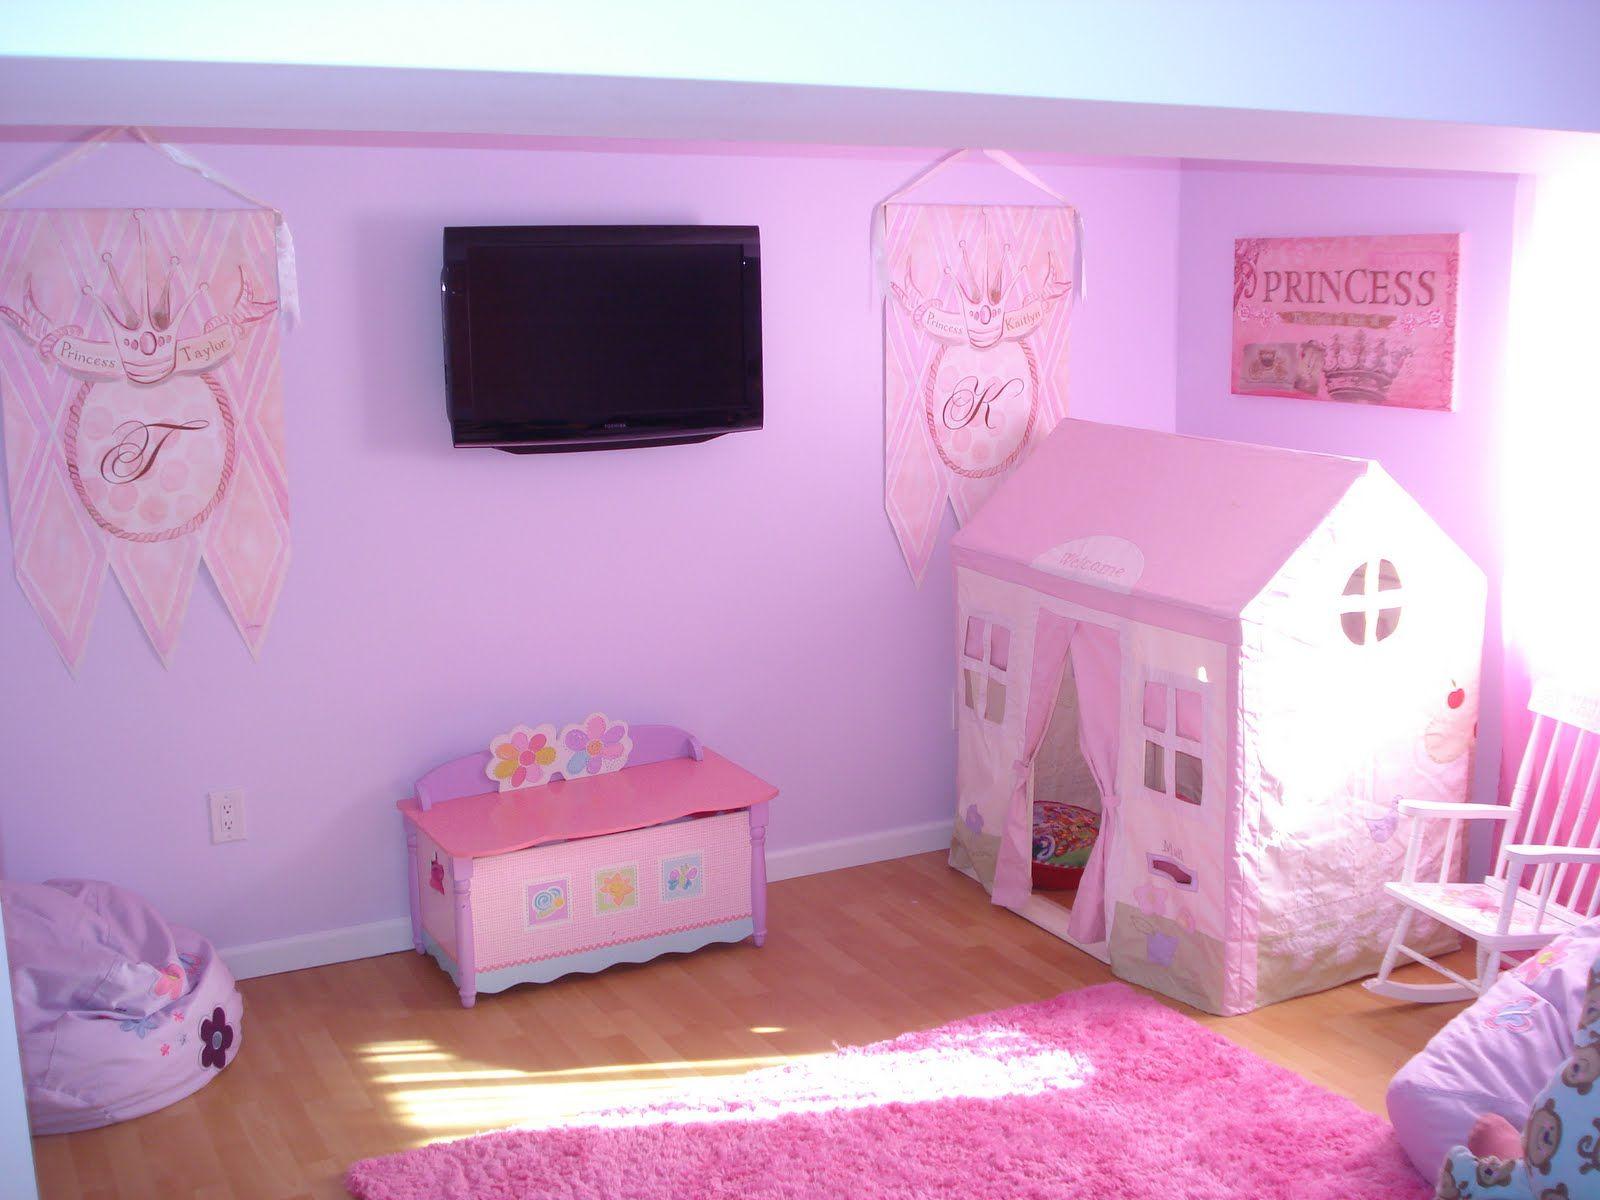 Girl Playroom Decorating Ideas Theme And Decor Ideas For